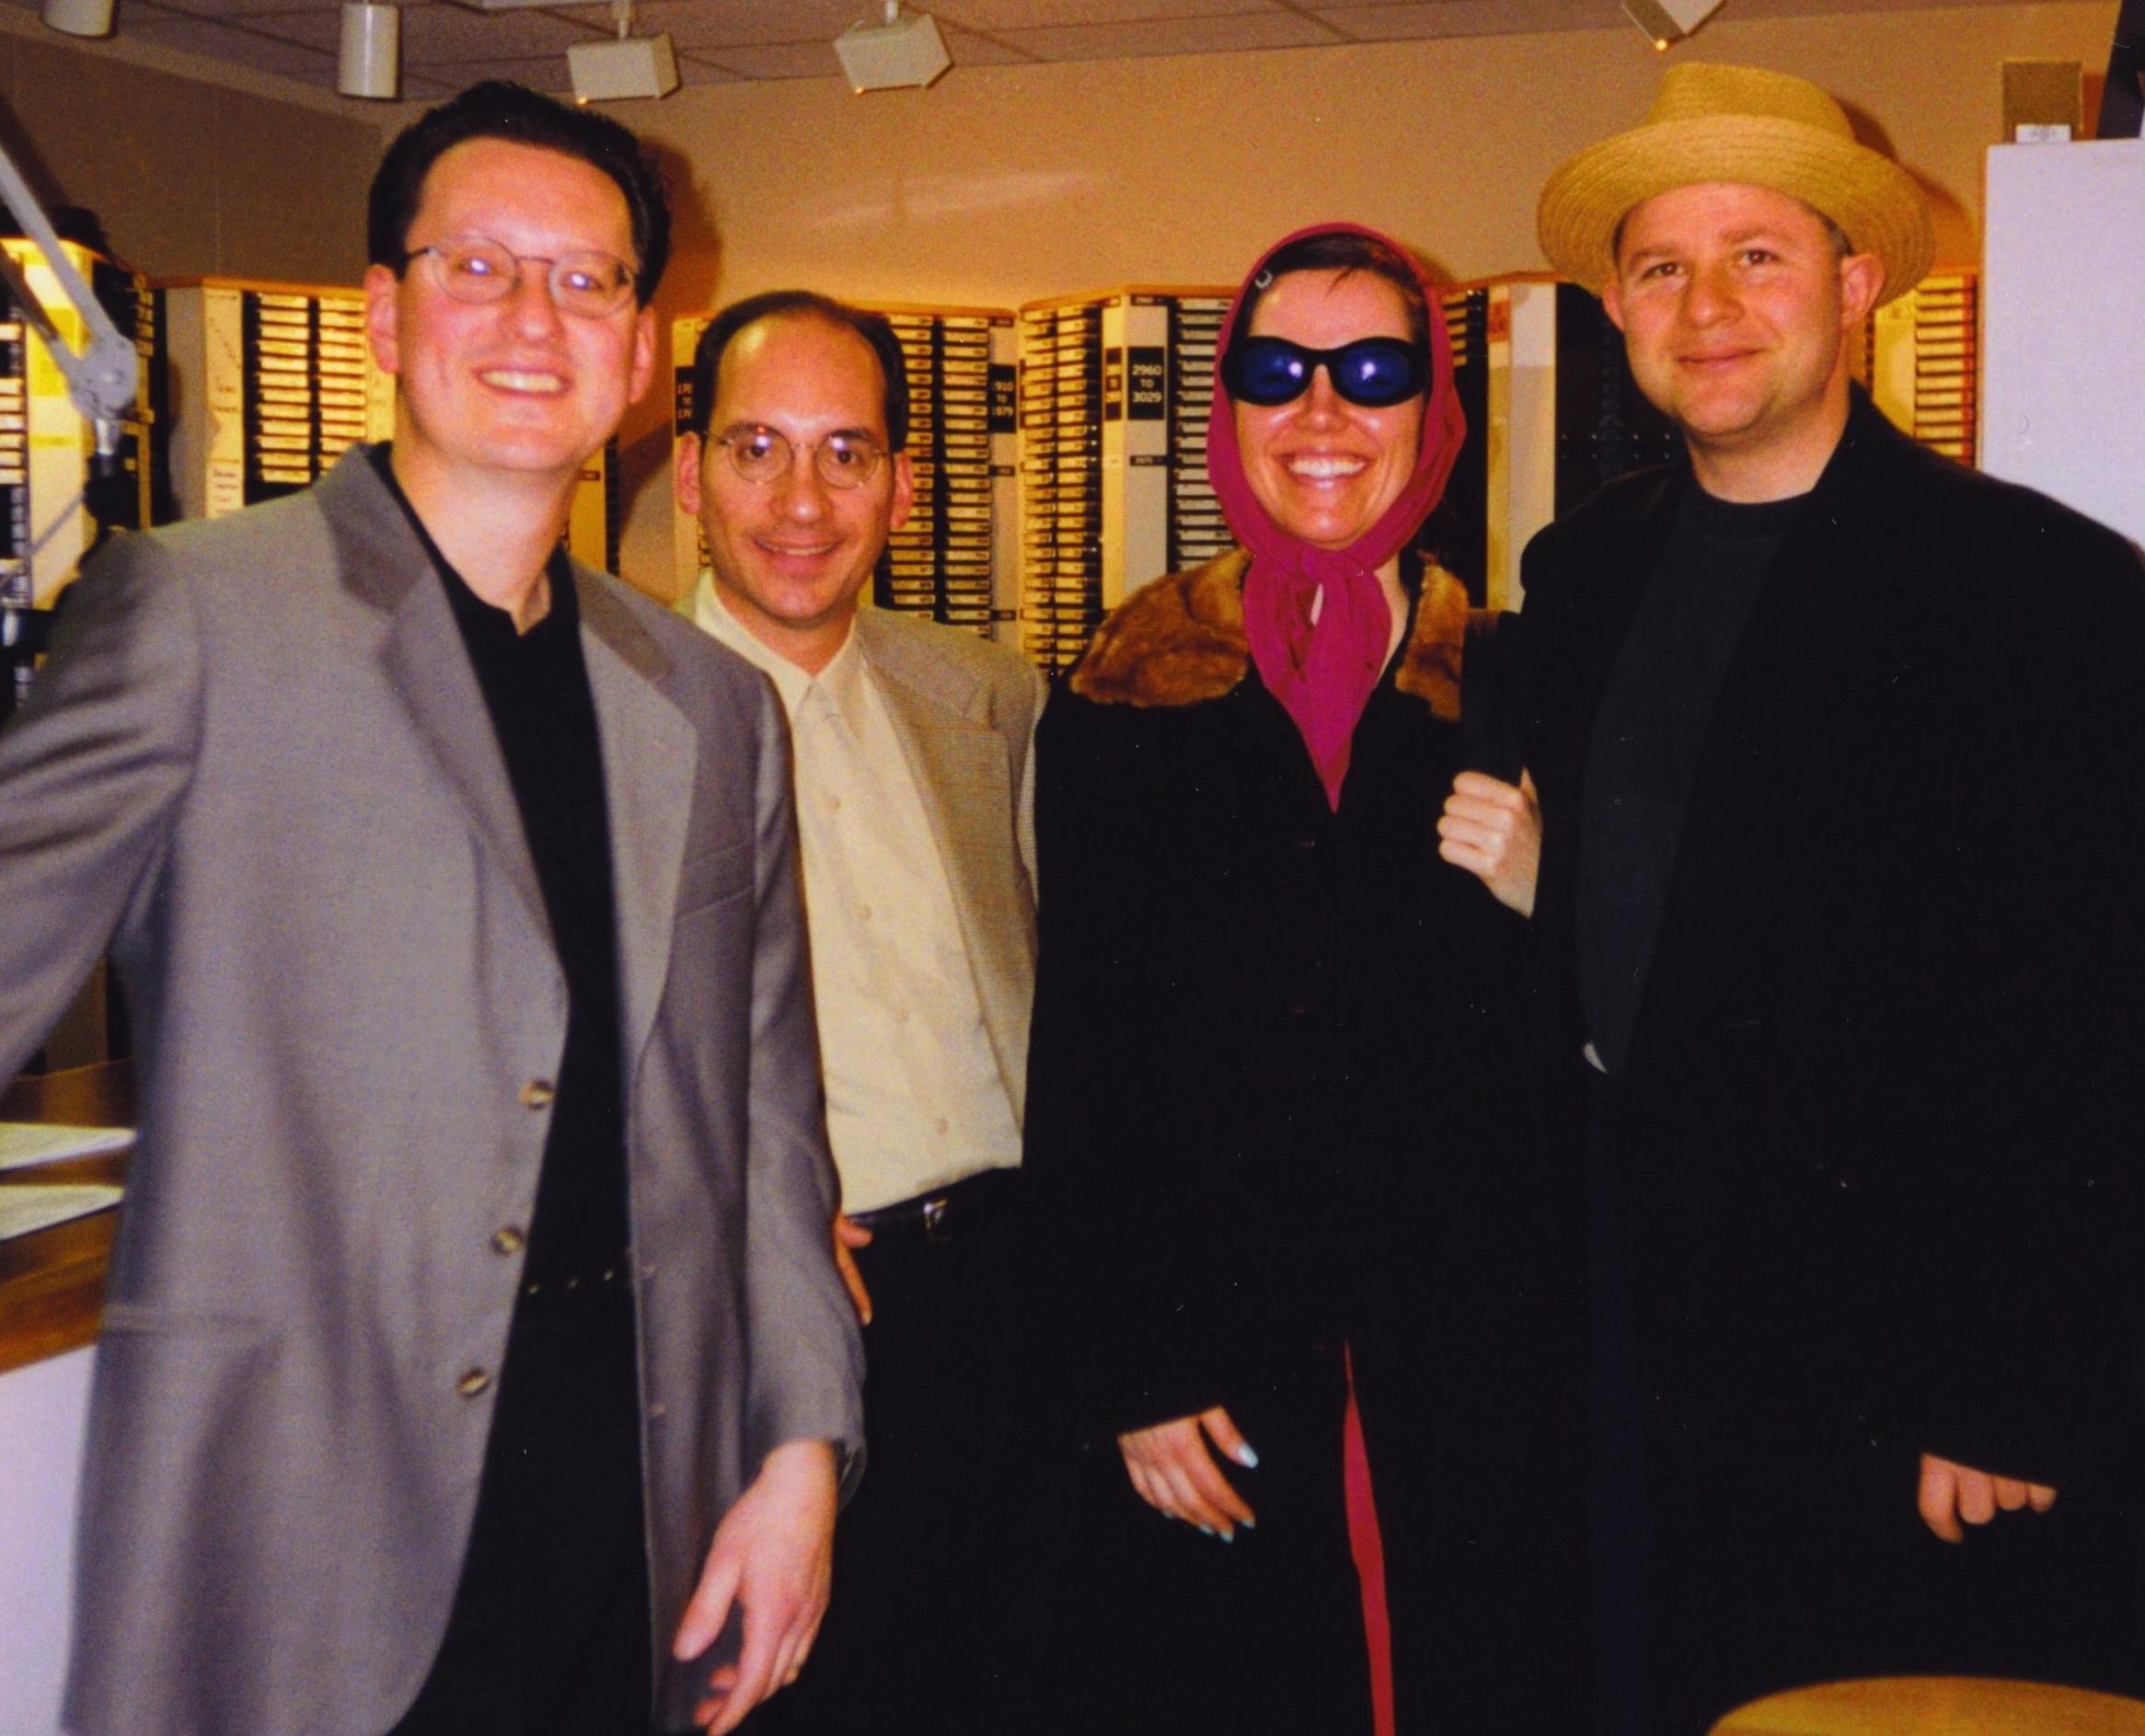 Lavay Smith & Chris Siebert at WPEN Studios